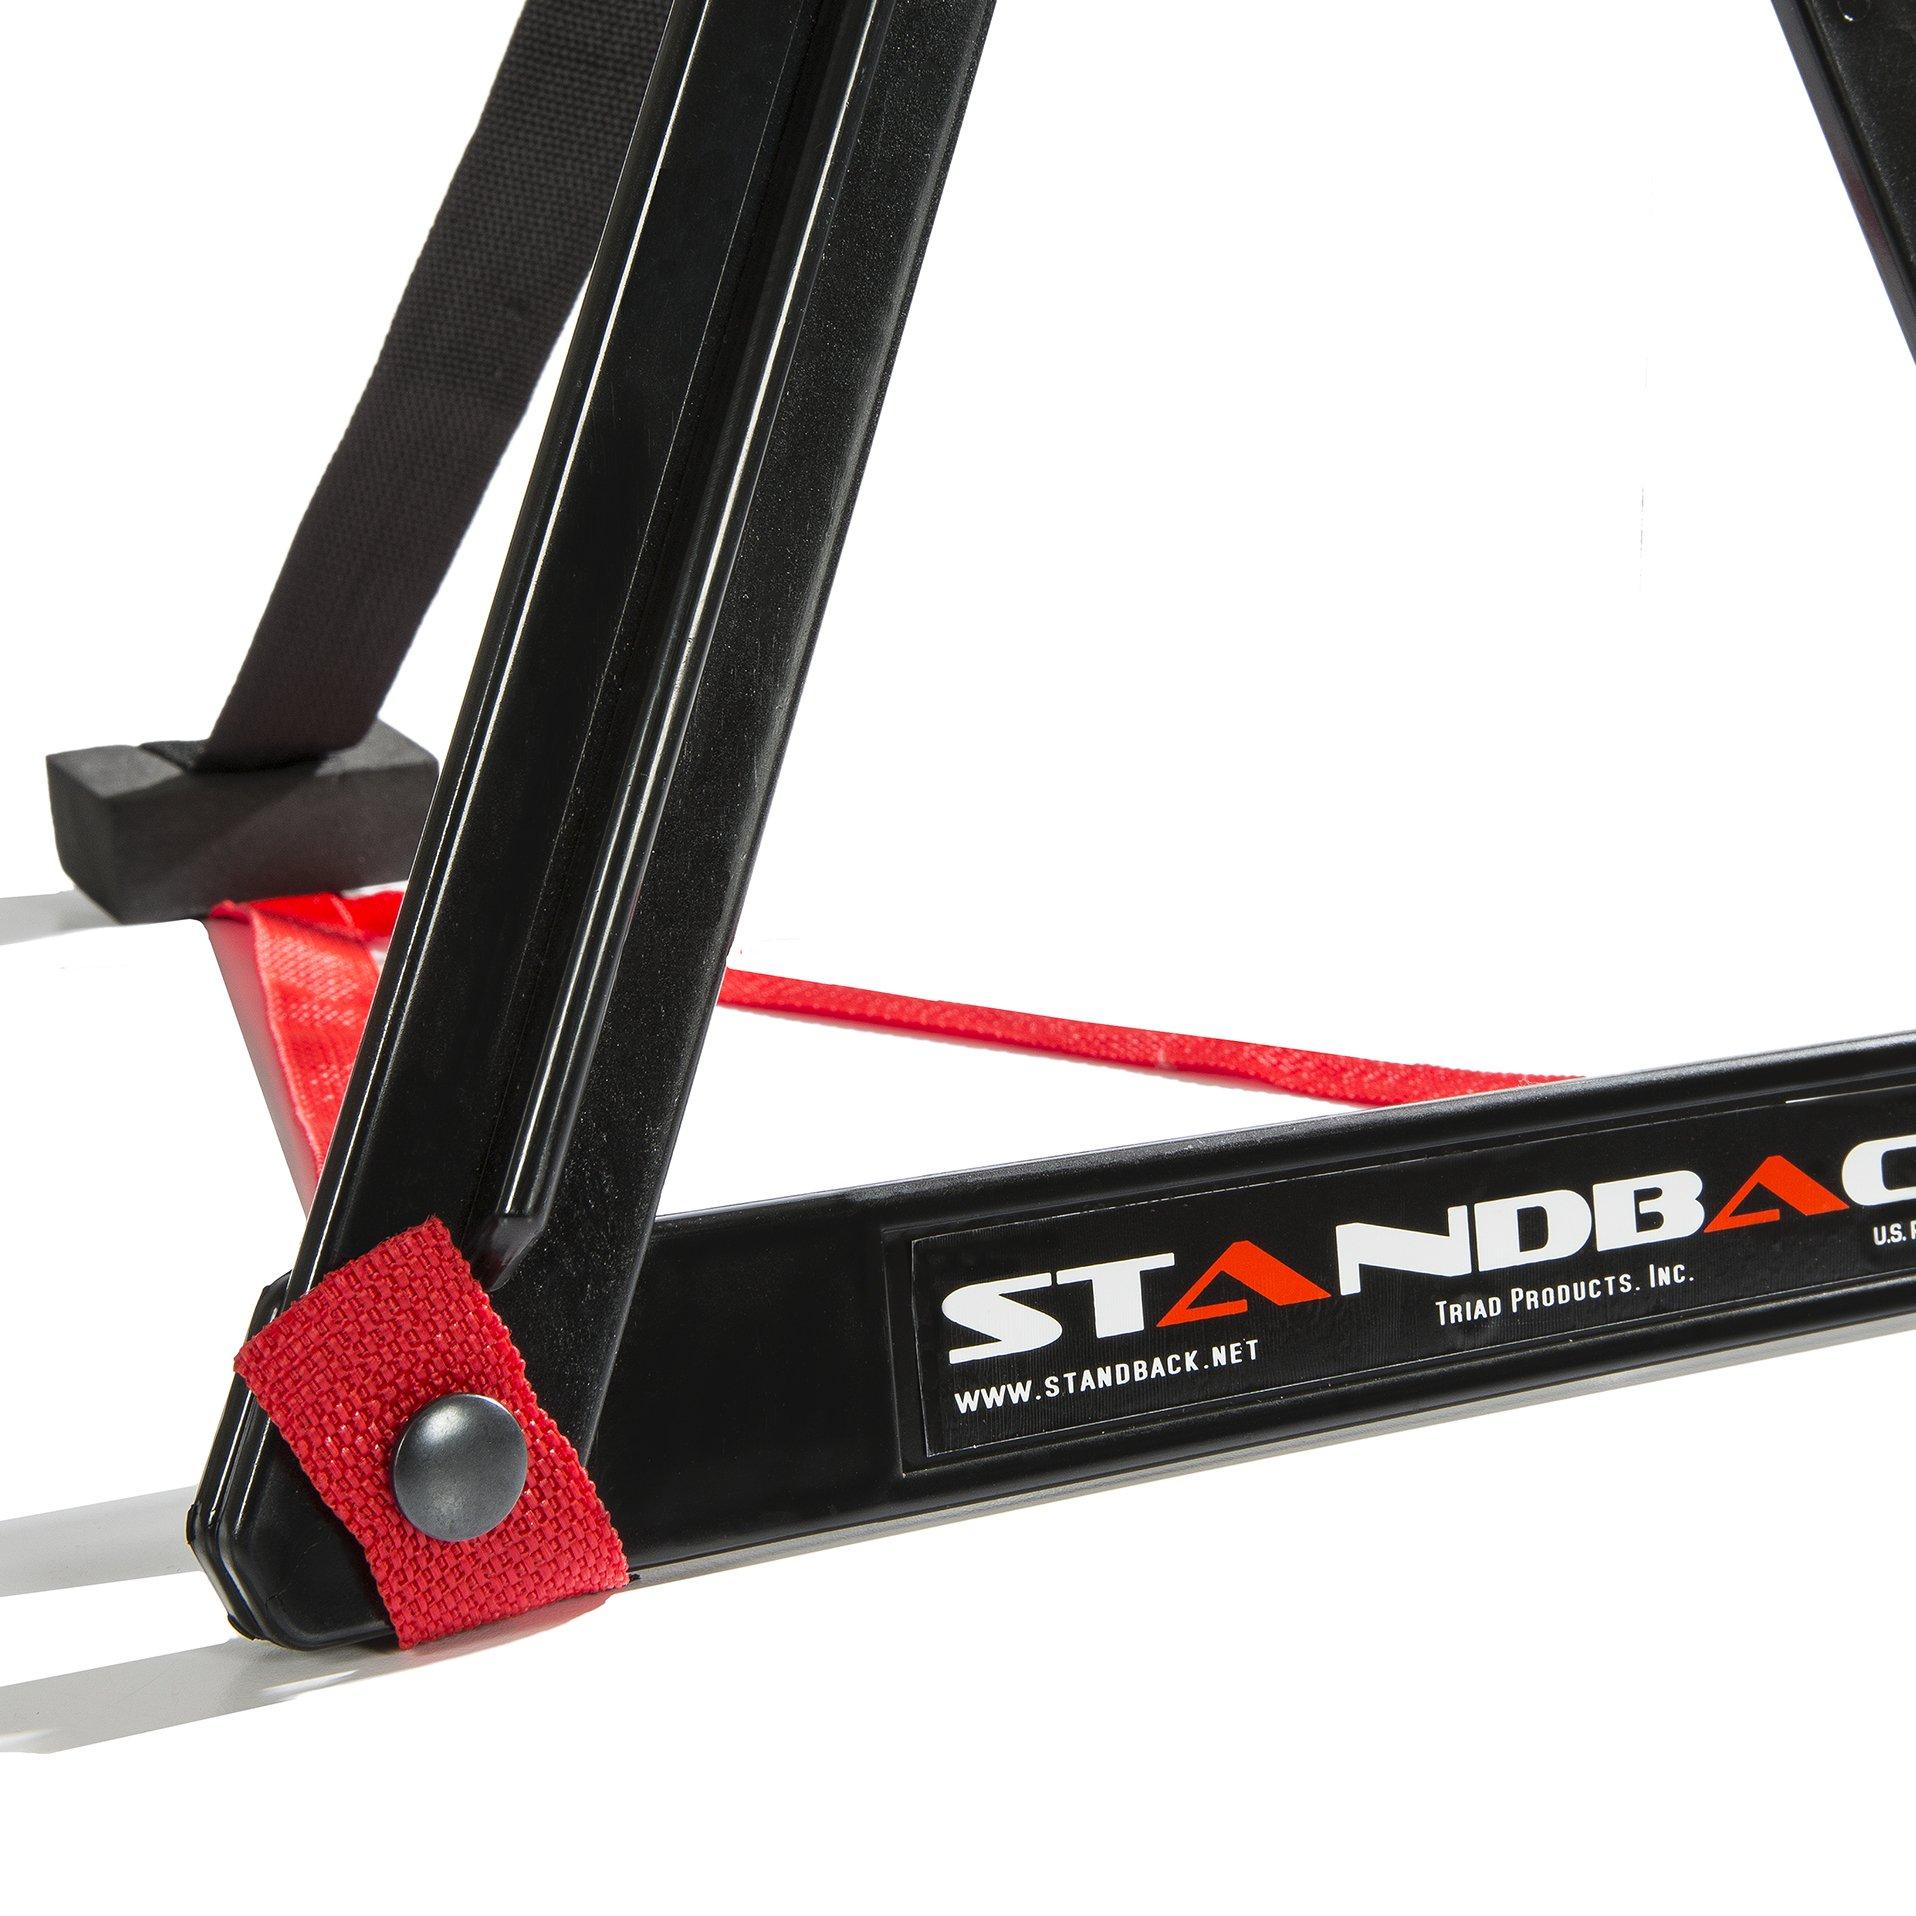 Standback Amp Stand, Light, Compact, and Adjustable